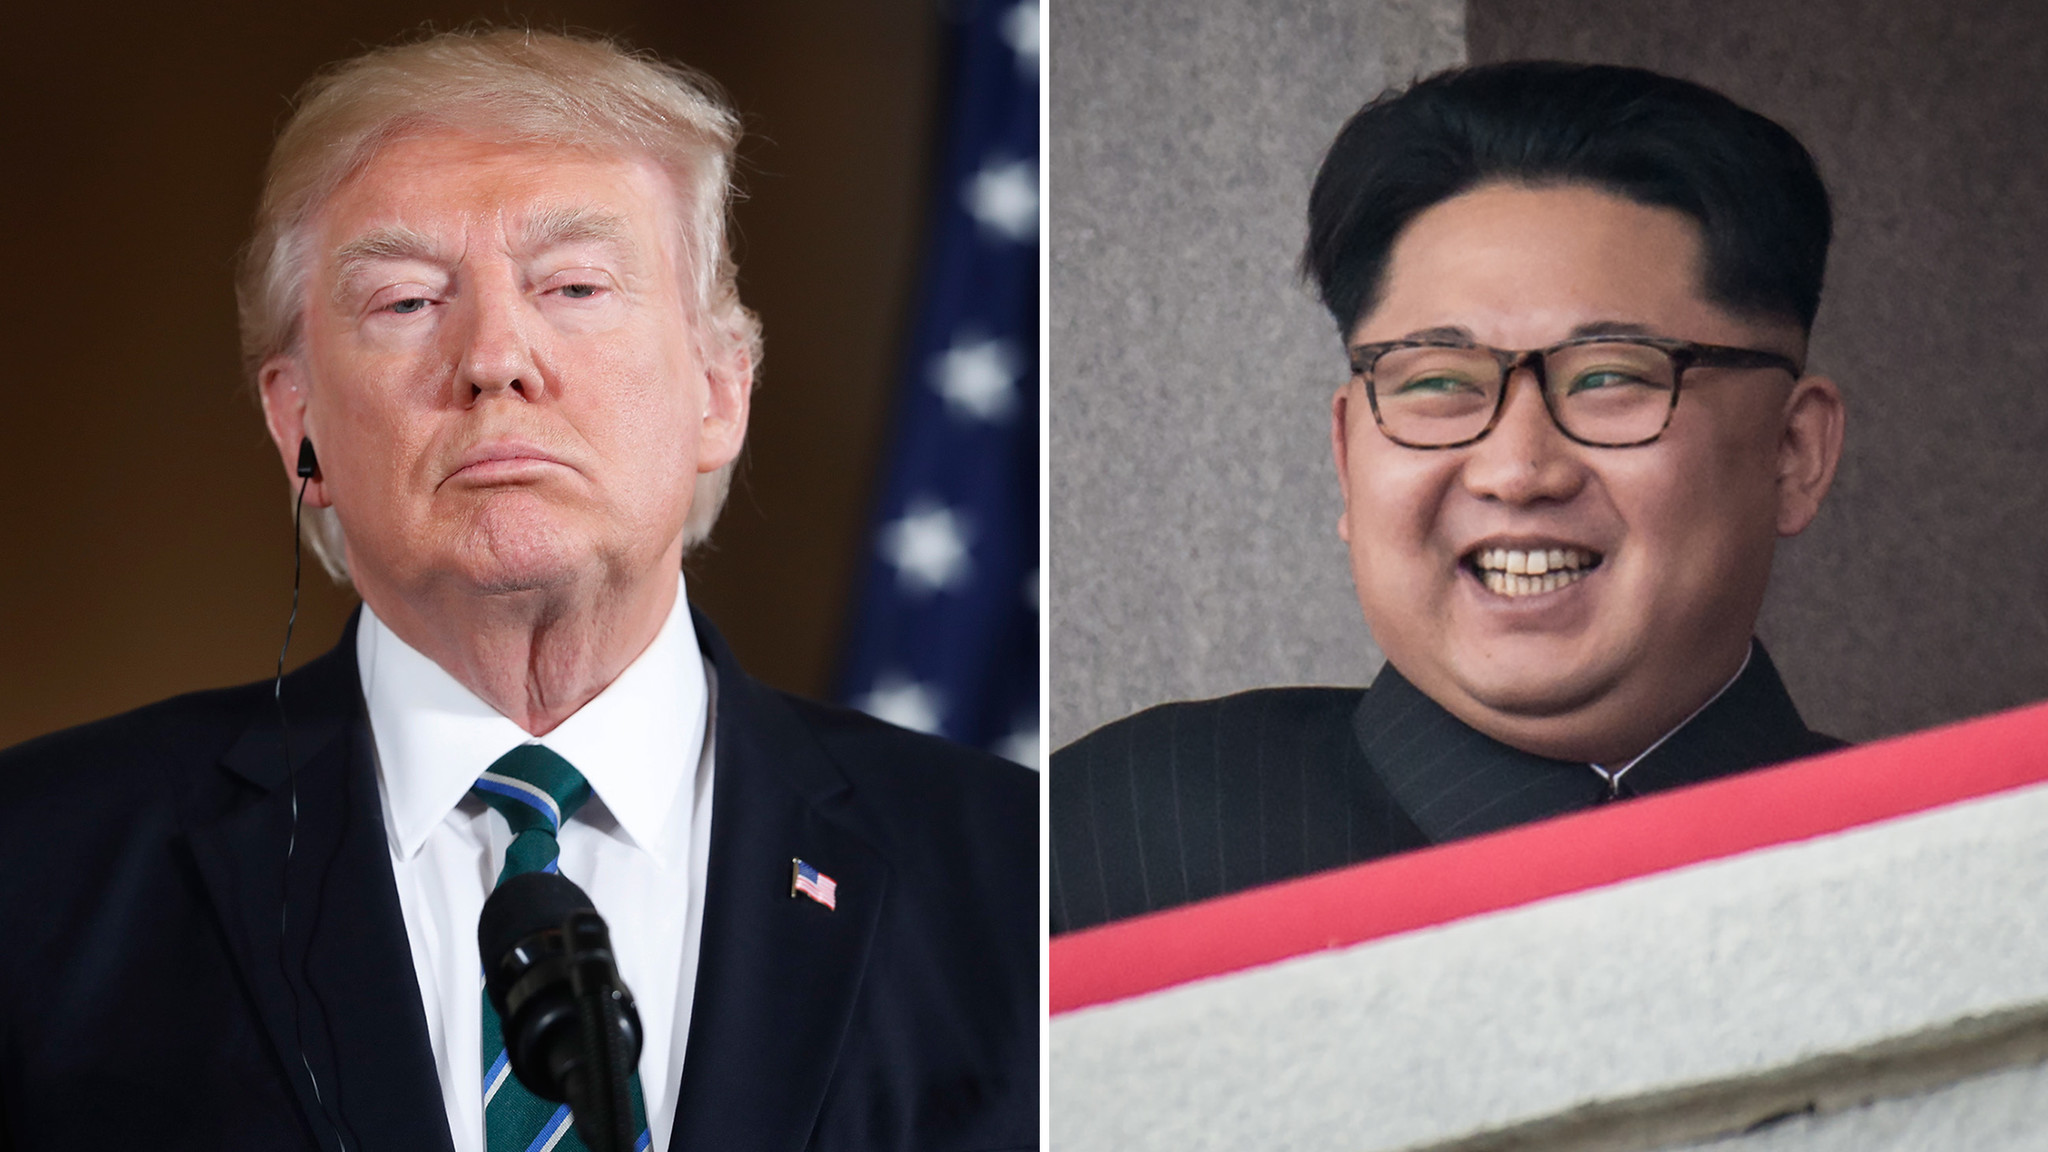 ct-trump-north-korea-nuclear-war-crimeshop.jpg